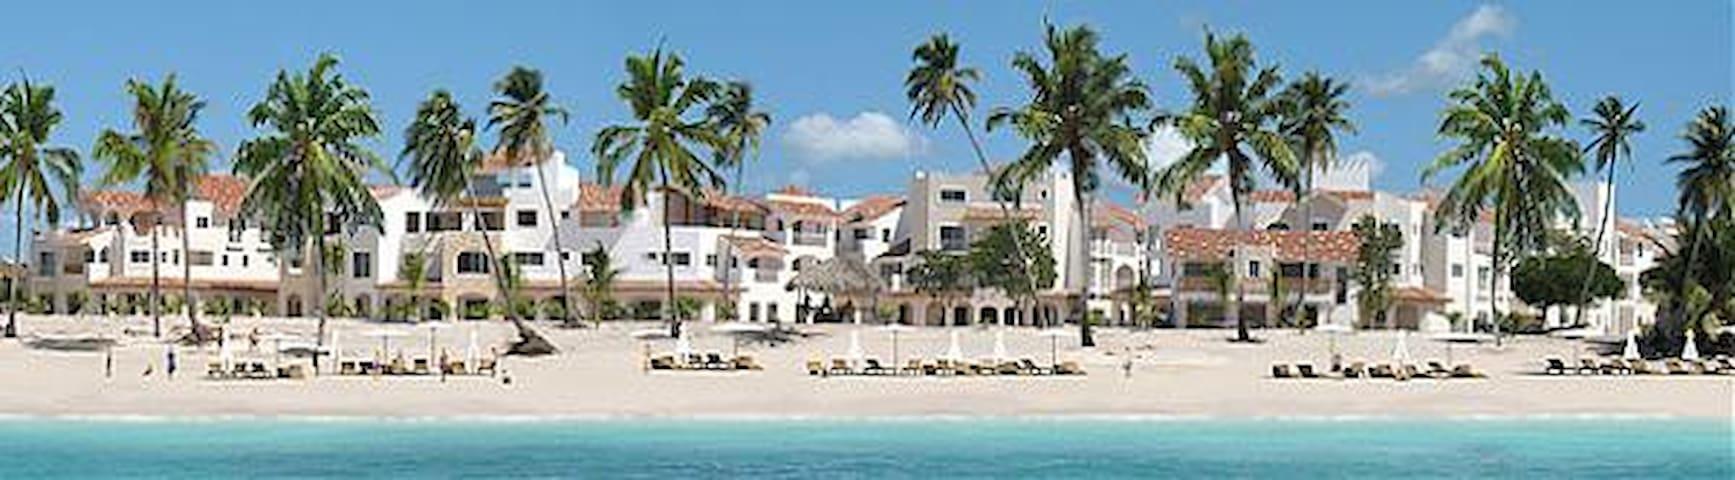 Vacaciones Inolvidables!!! Cadaques Caribe